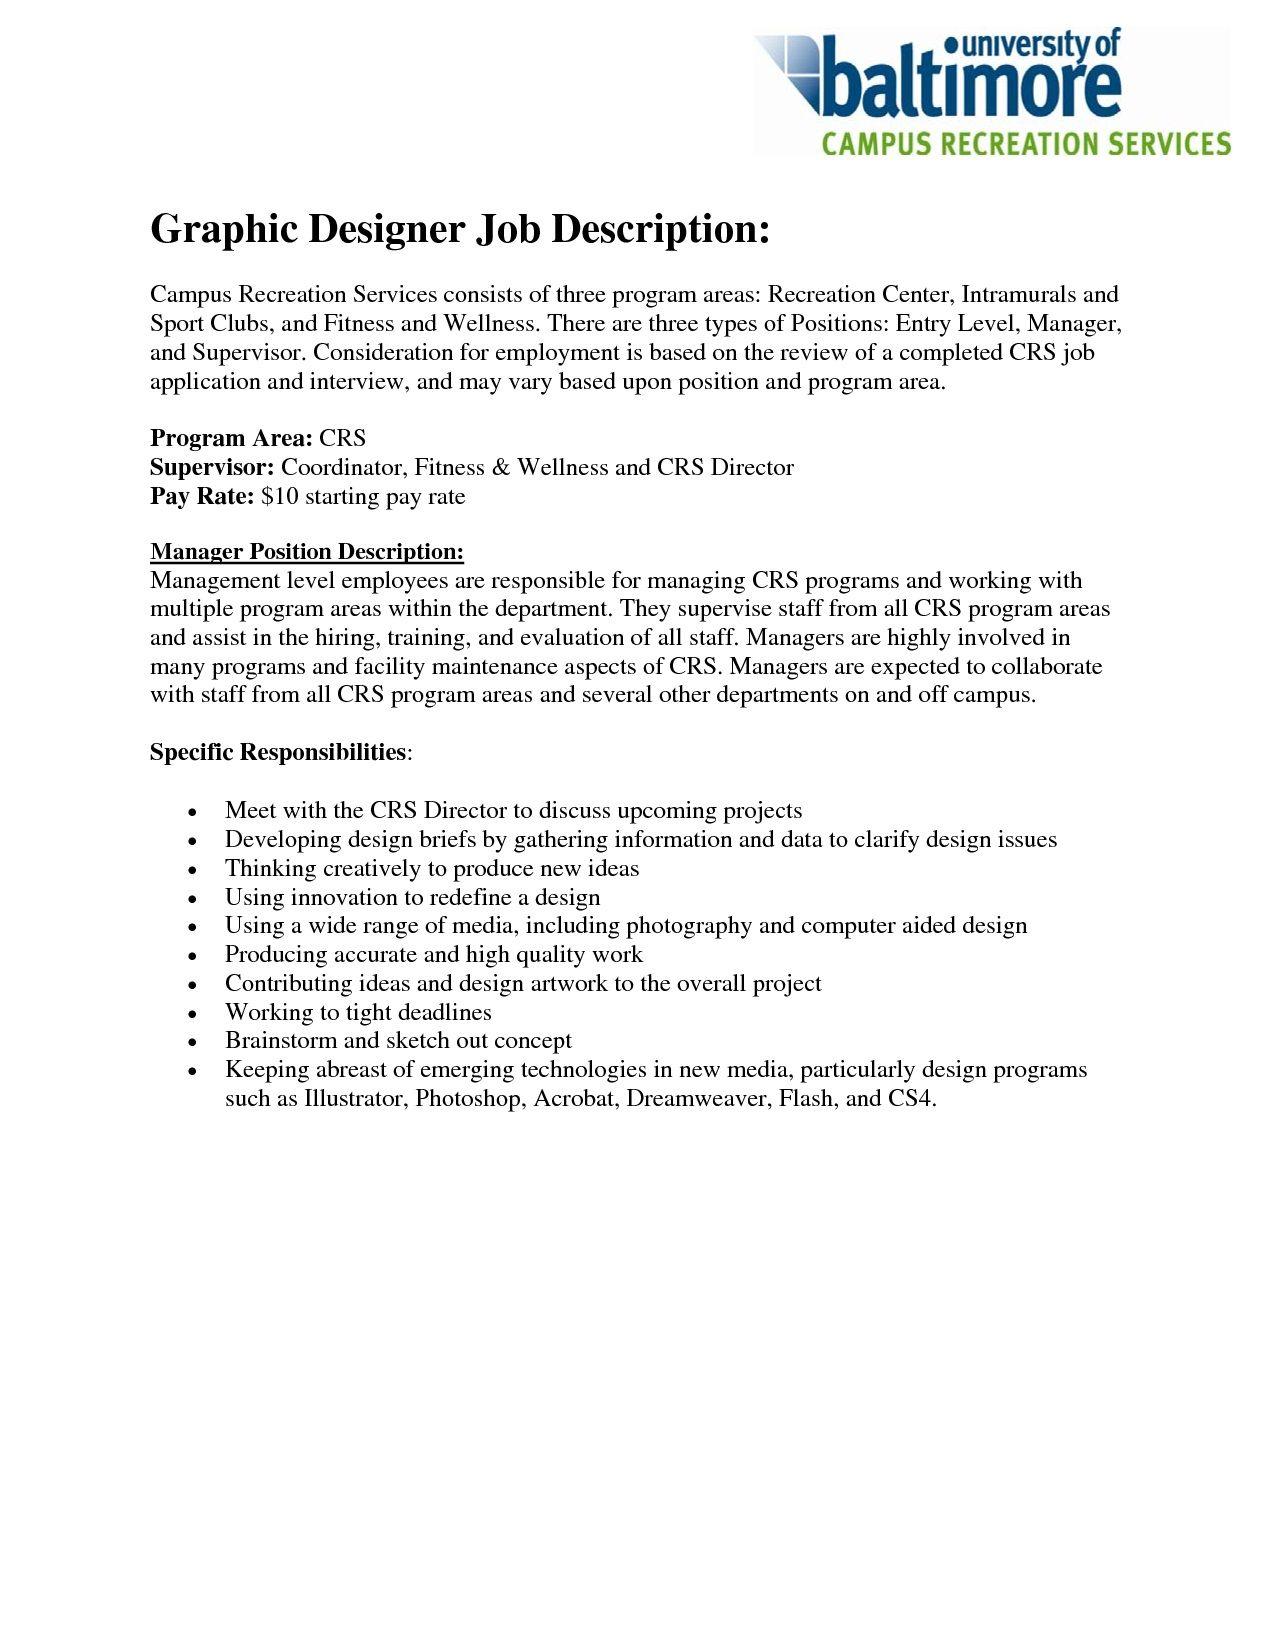 Interior Design Jobs Near Me Entry Level